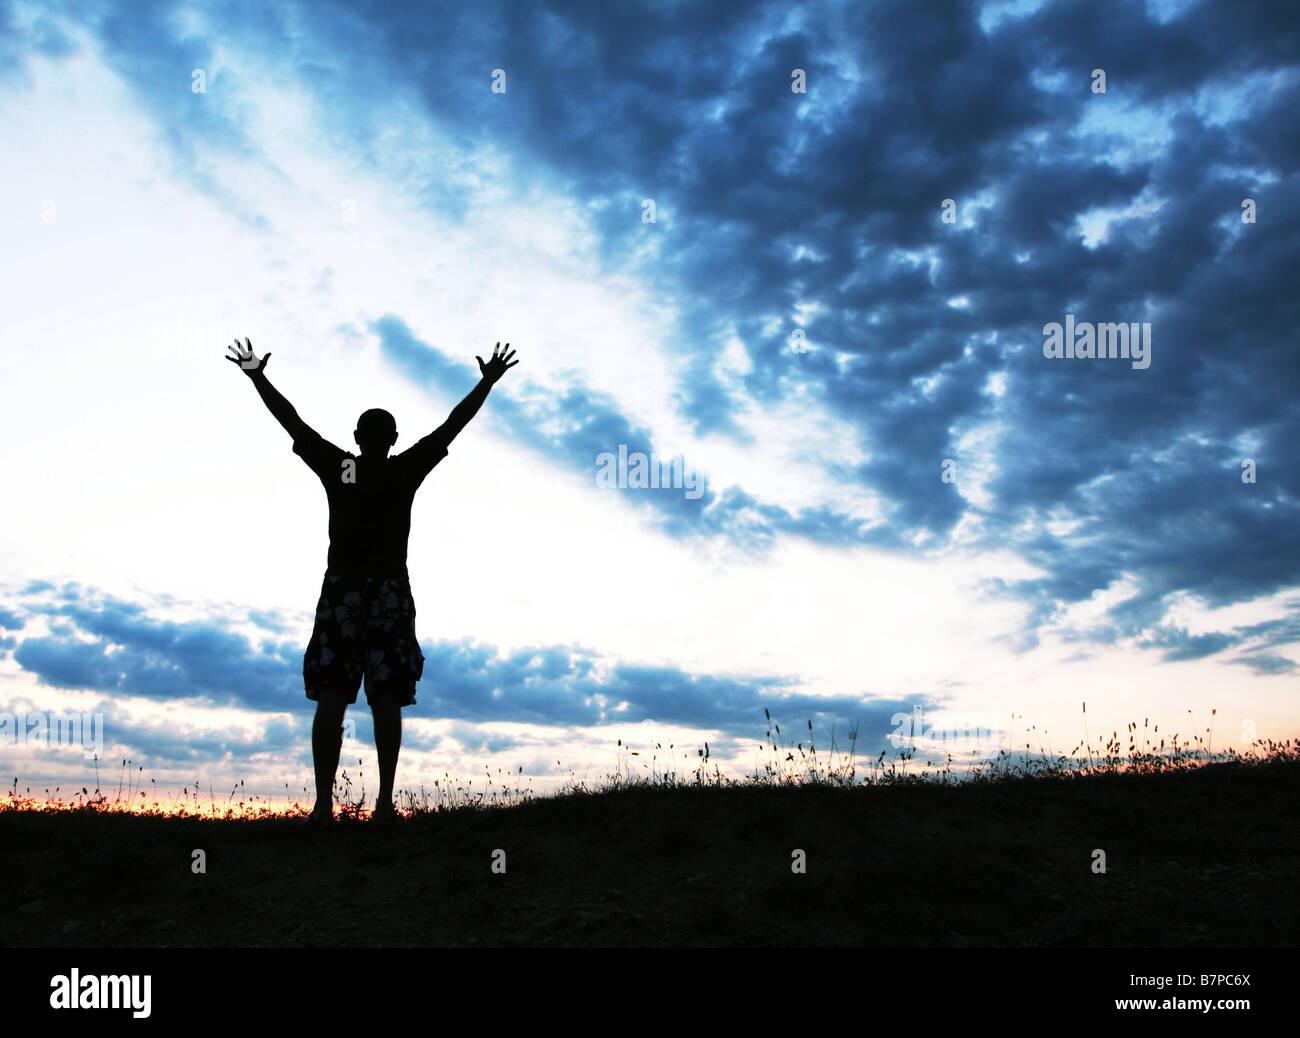 Hombre feliz silueta Imagen De Stock